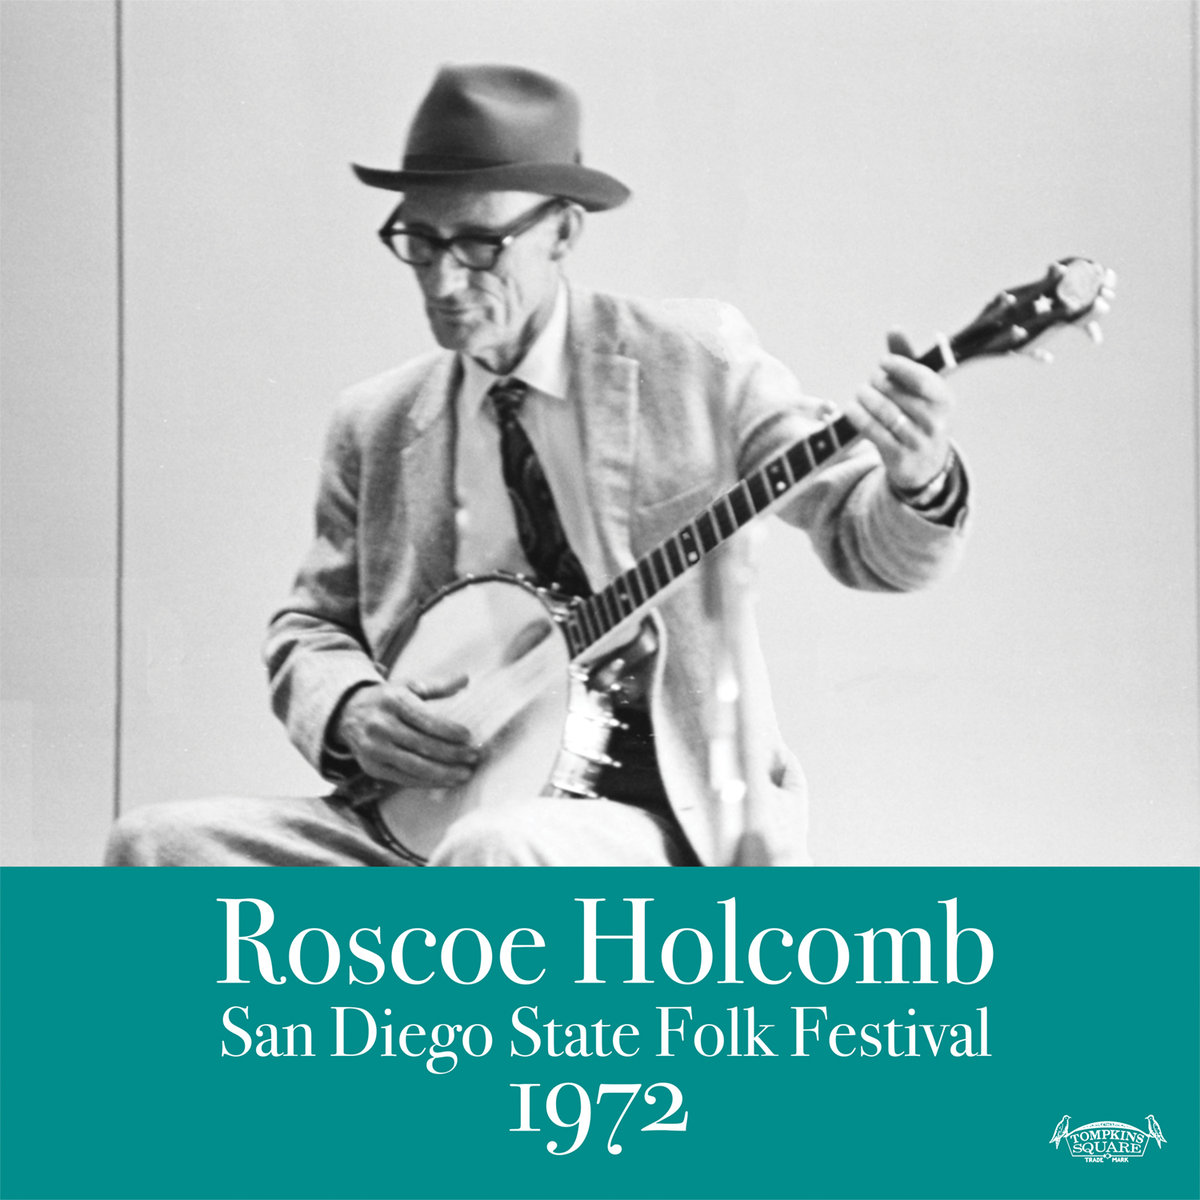 roscoe-holcomb-sd-folk-festival.png